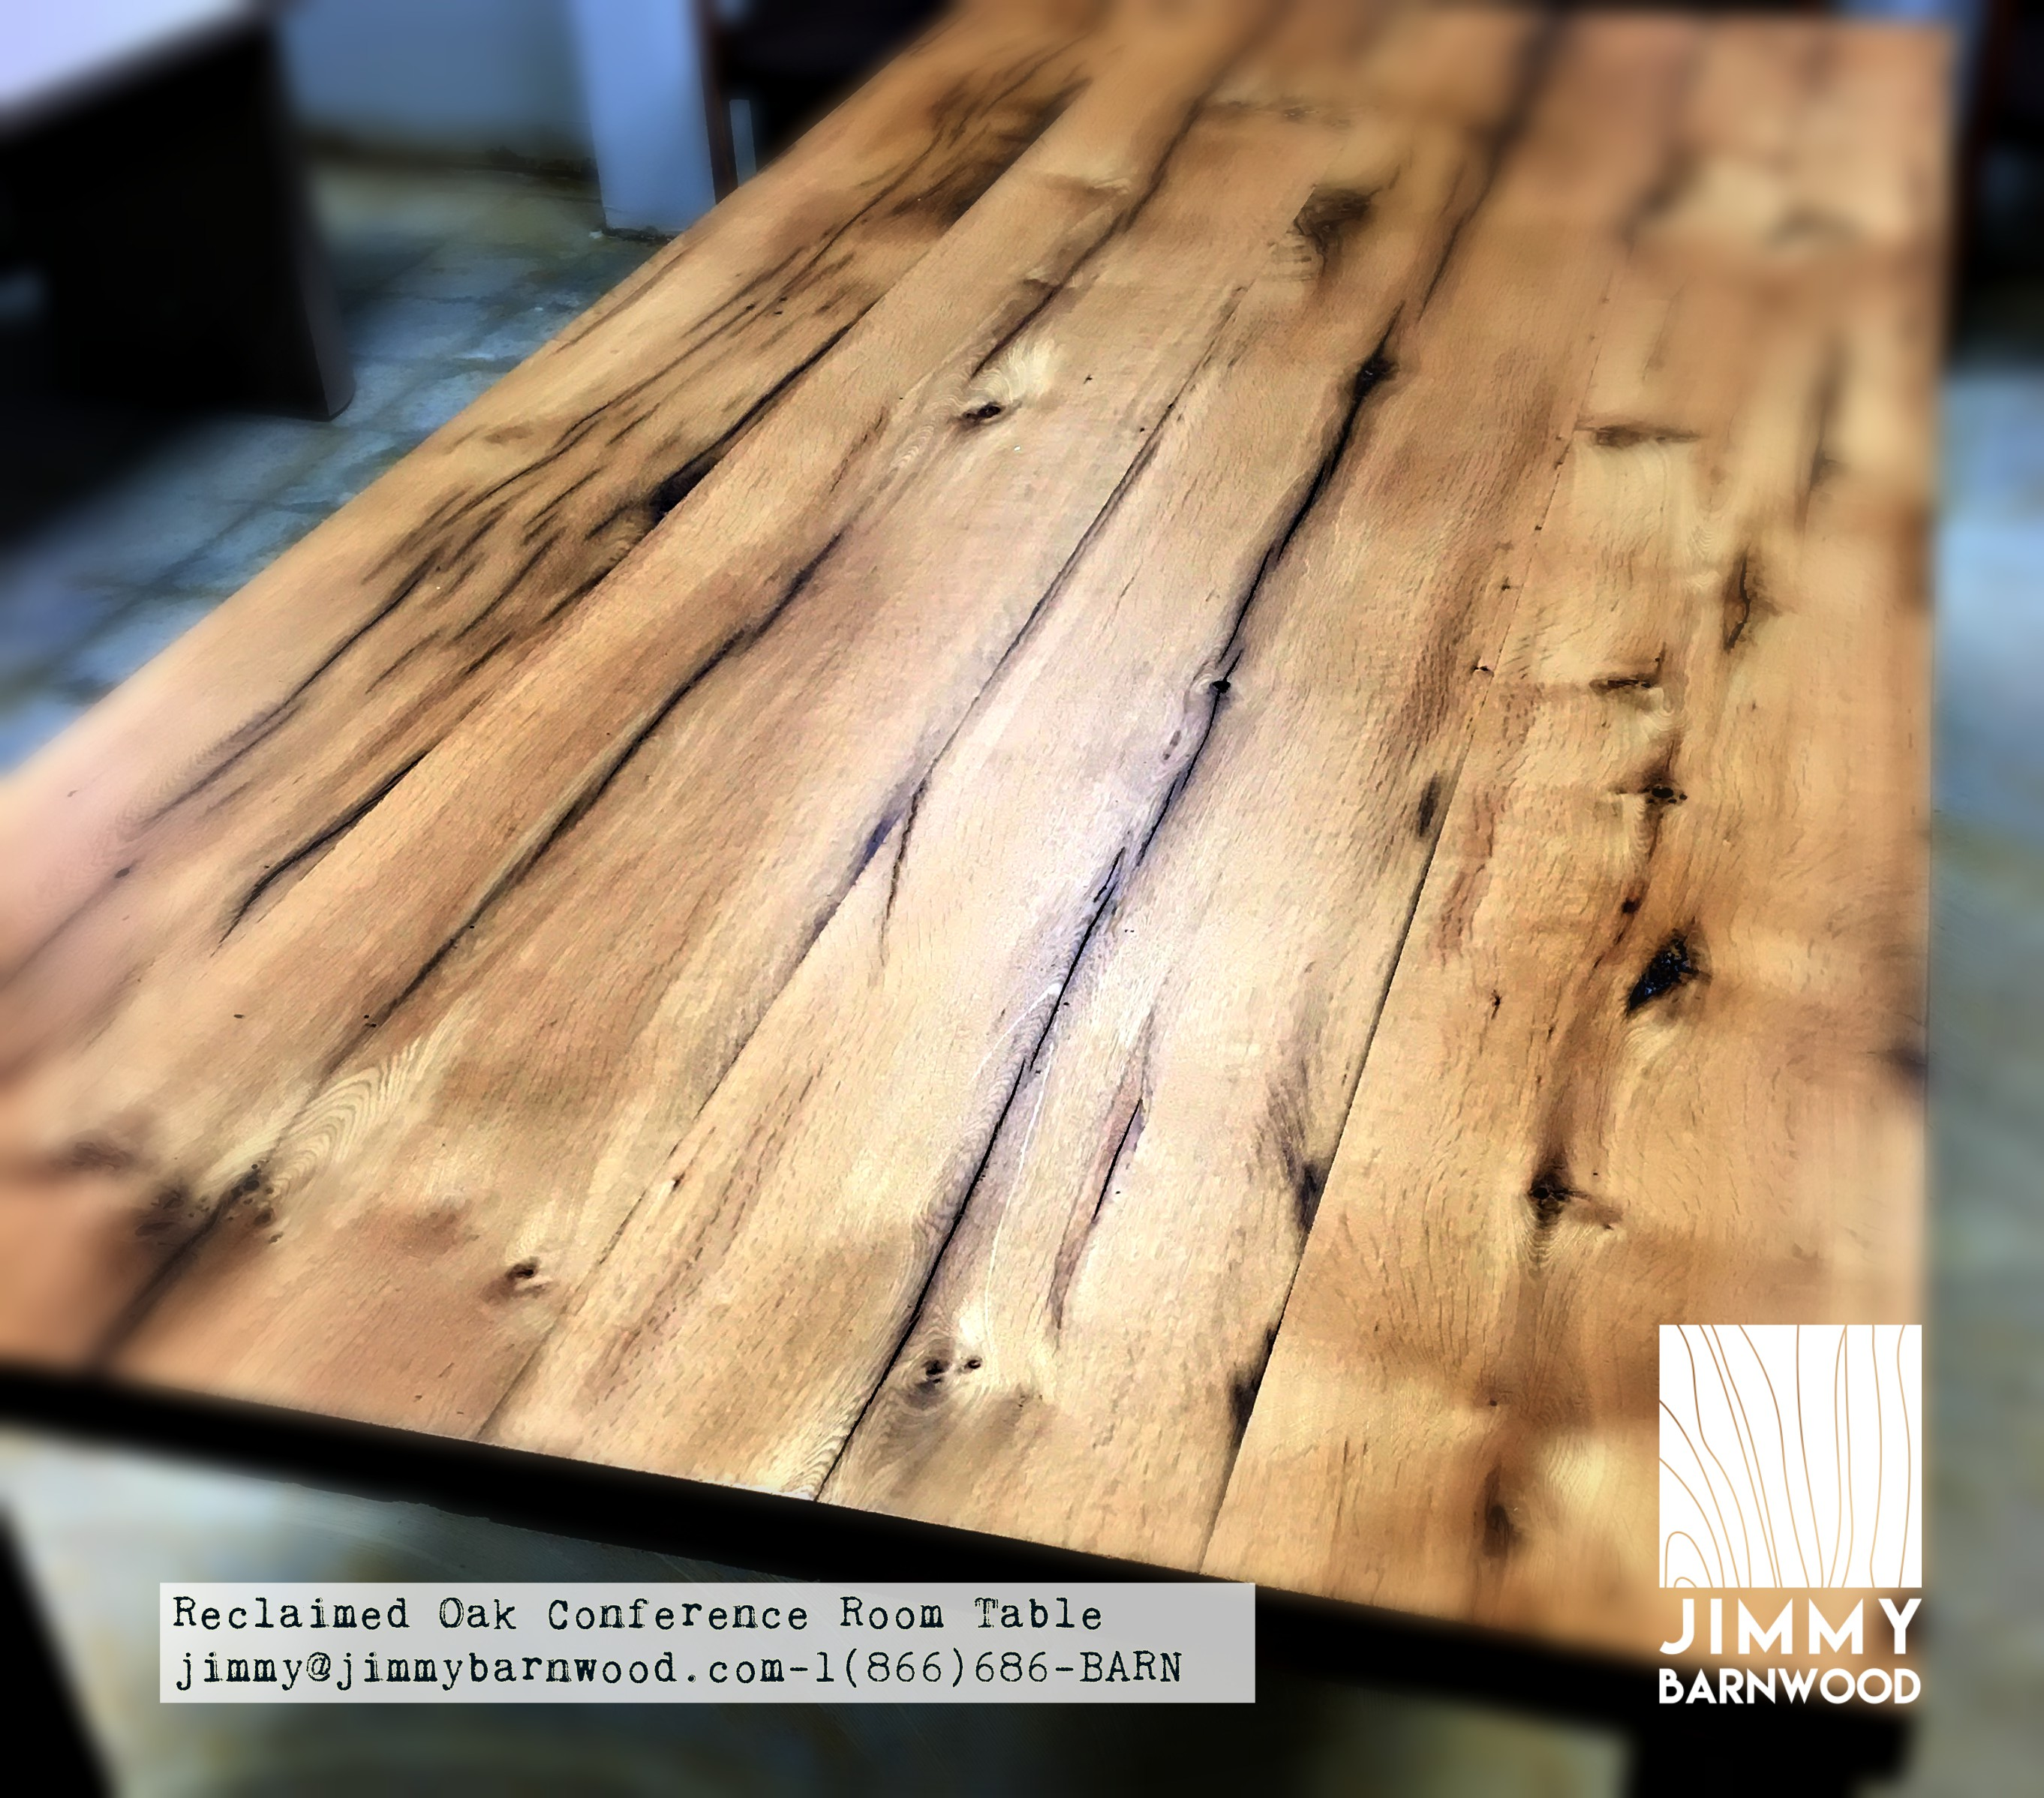 reclaimed-oak-conference-room-table-jimmy-barnwood.jpg